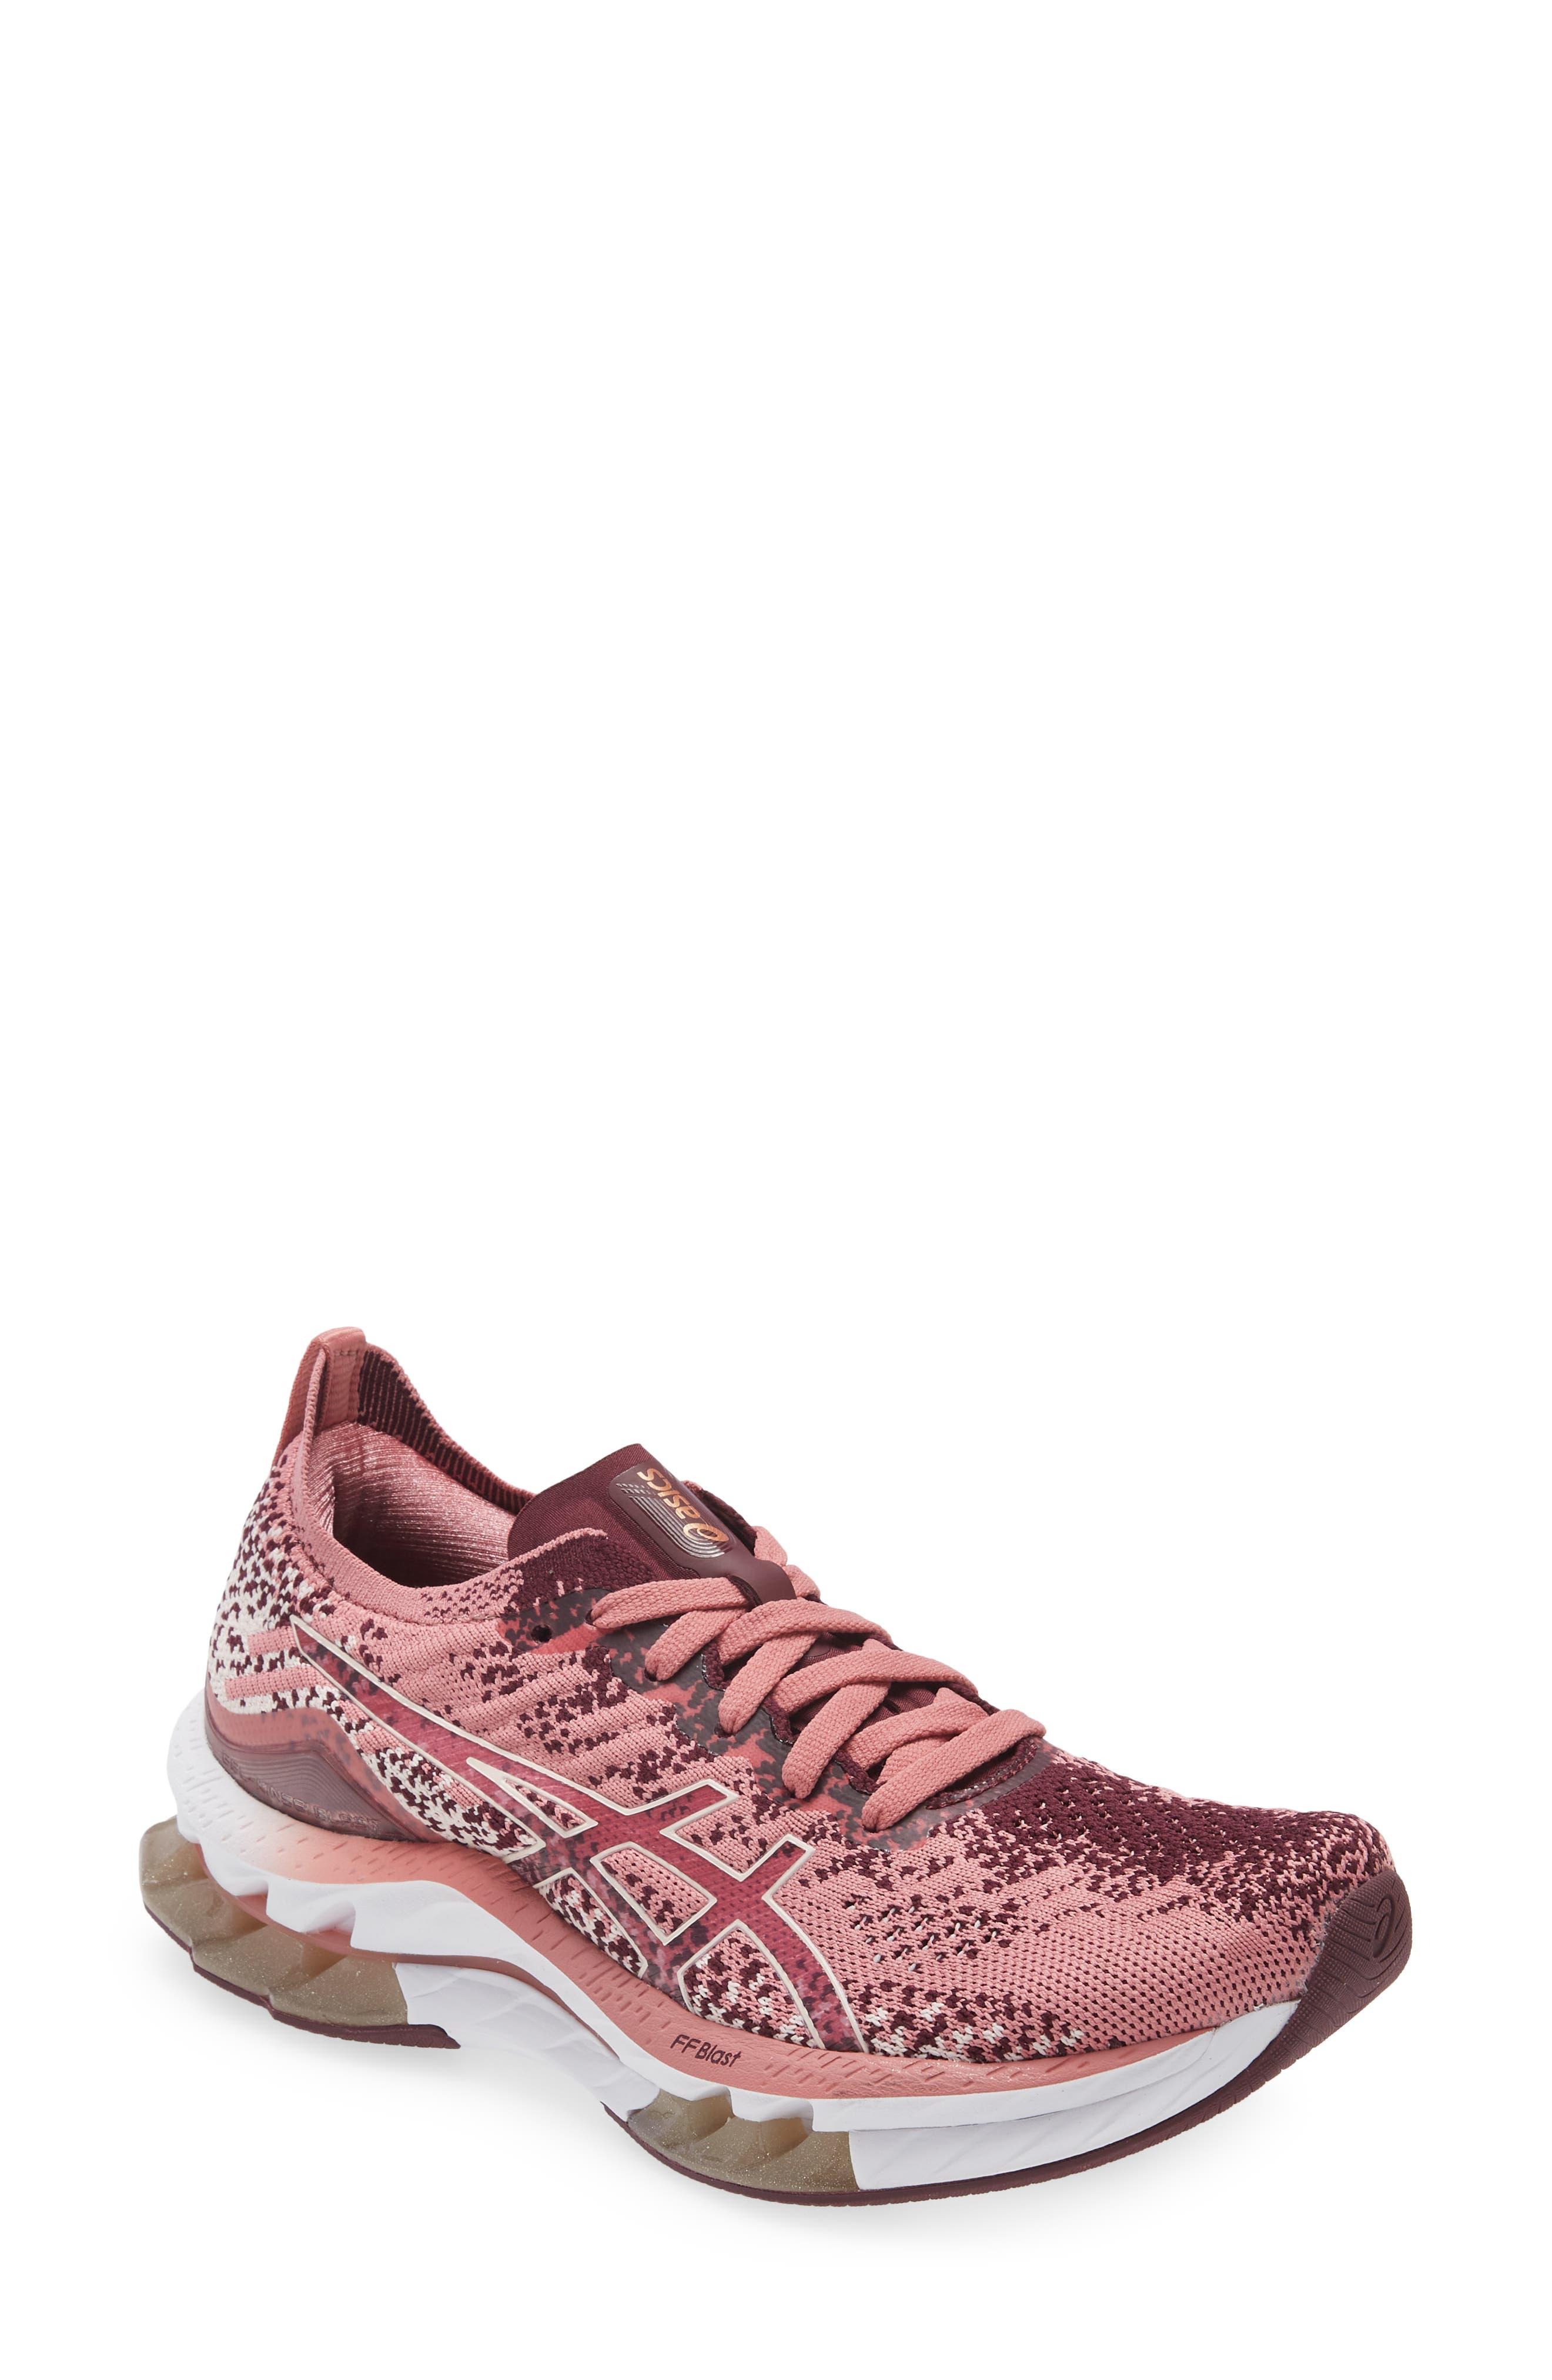 Women's Asics Kinsei Blast Running Shoe